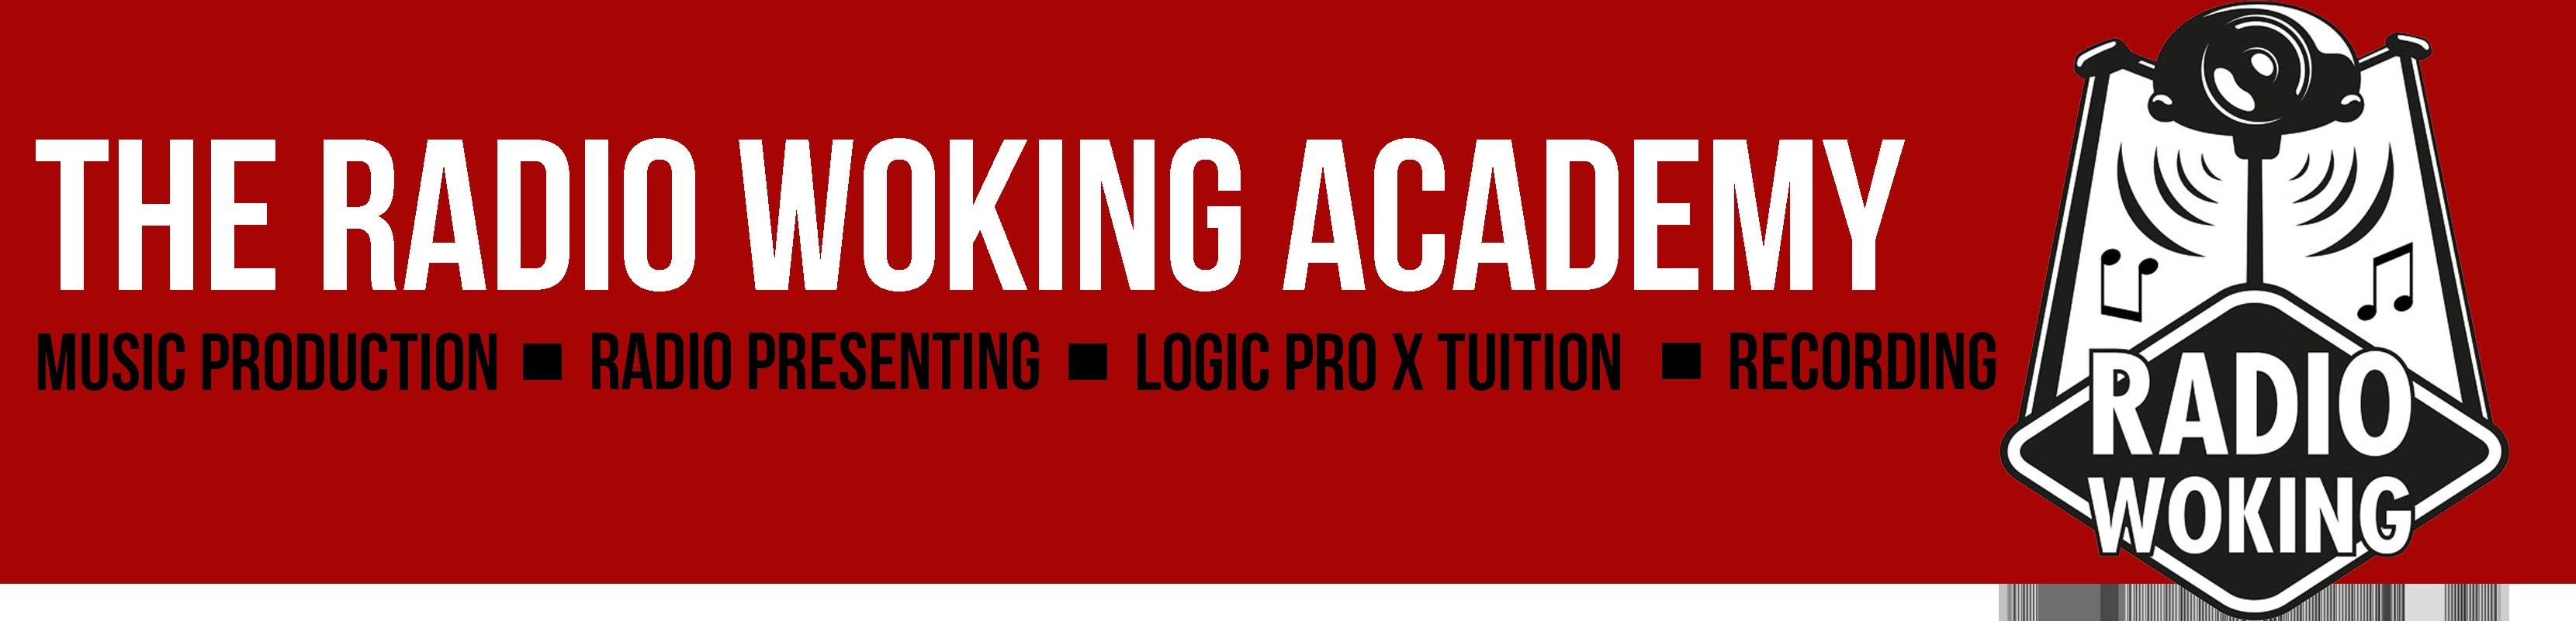 academy-banner